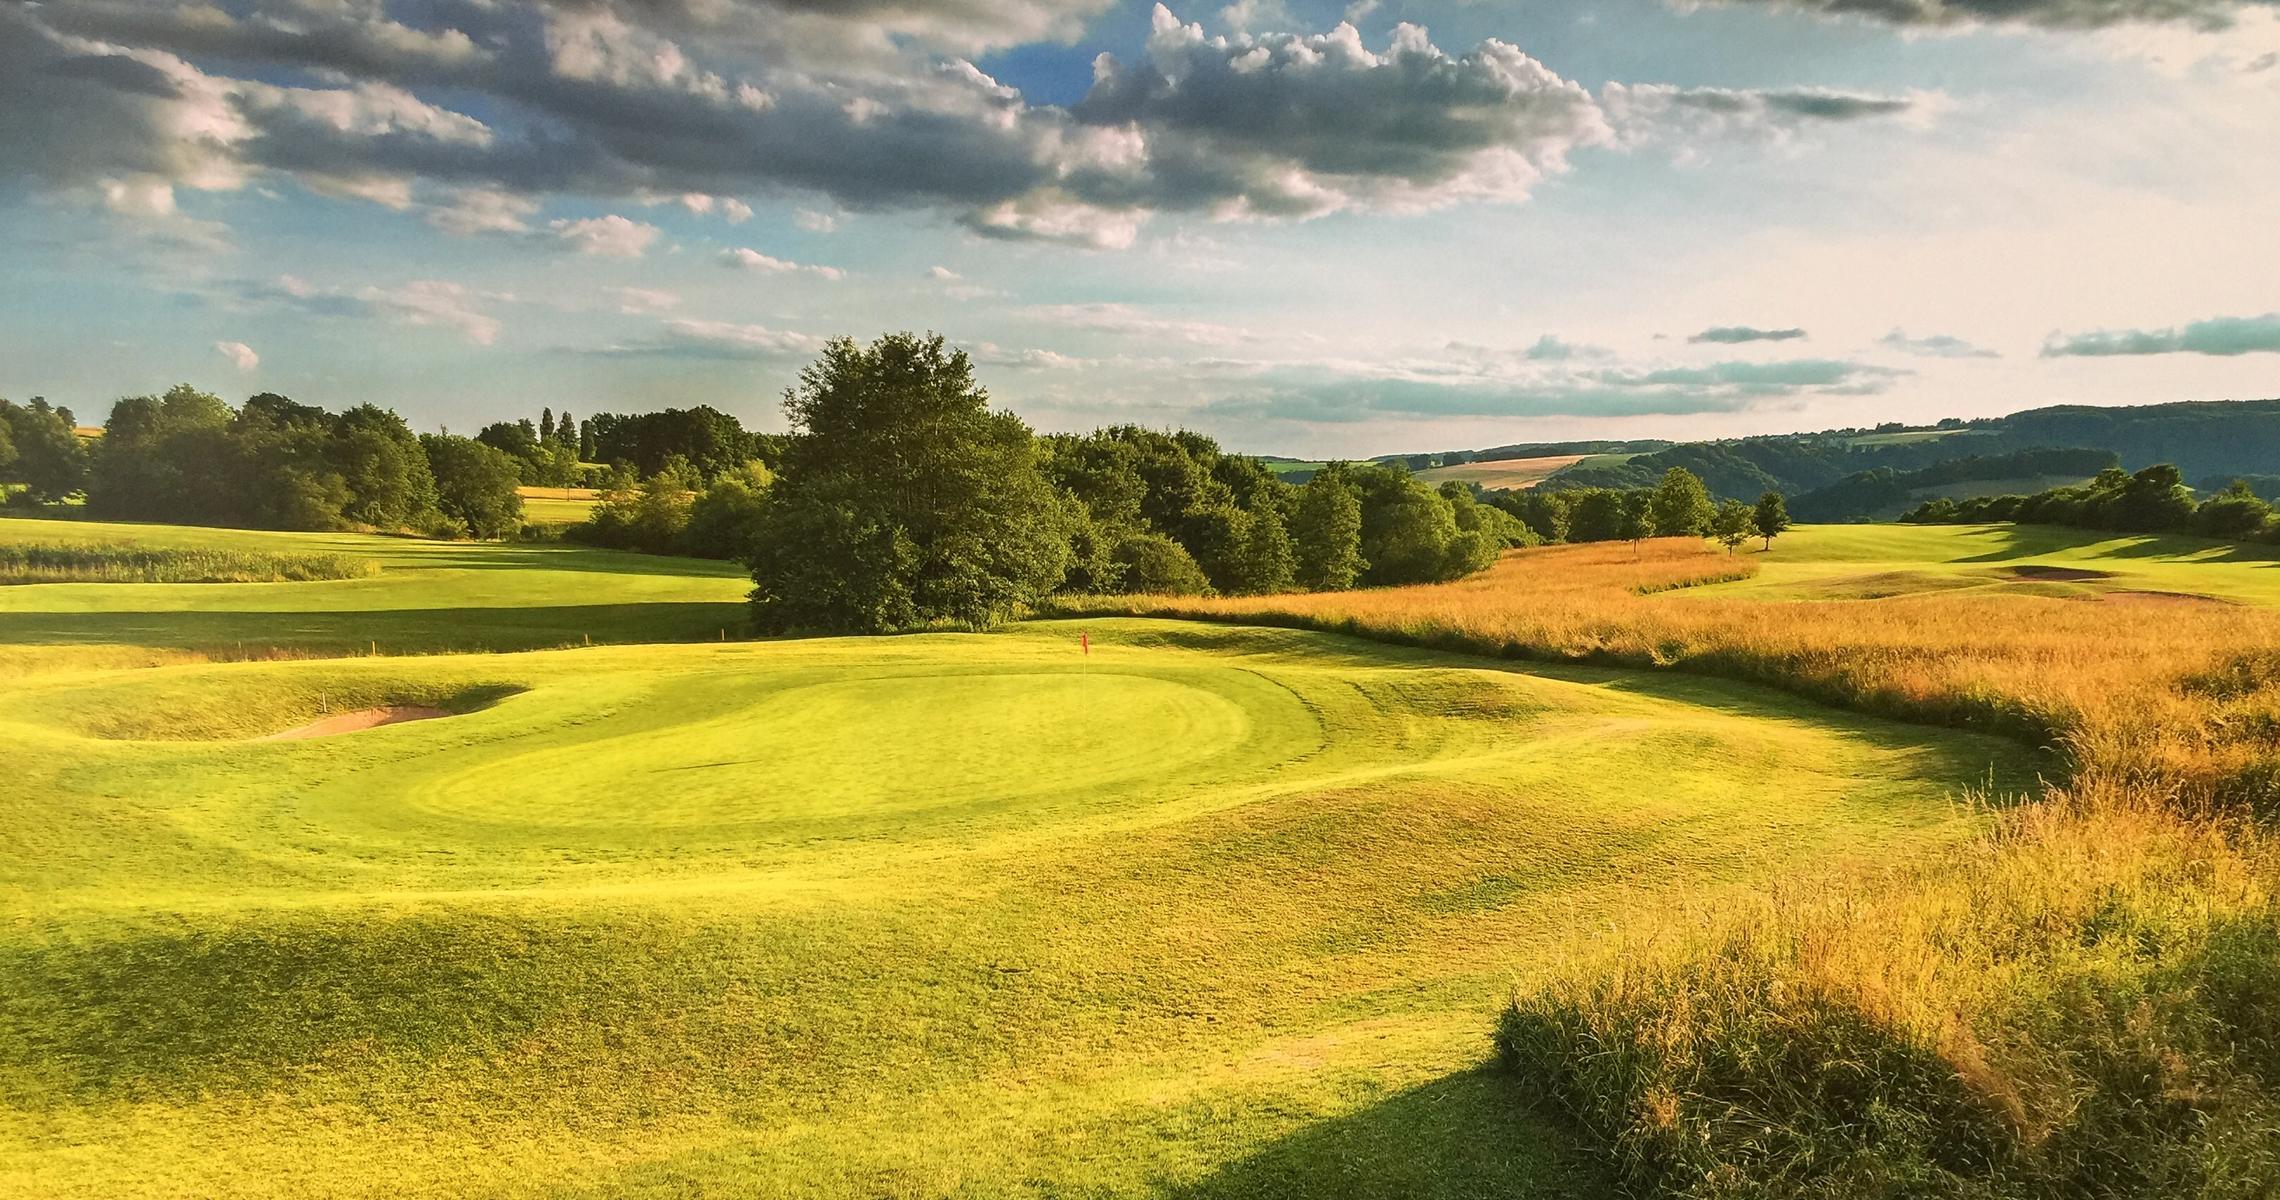 Overview of golf course named Golf-Resort Bitburger Land